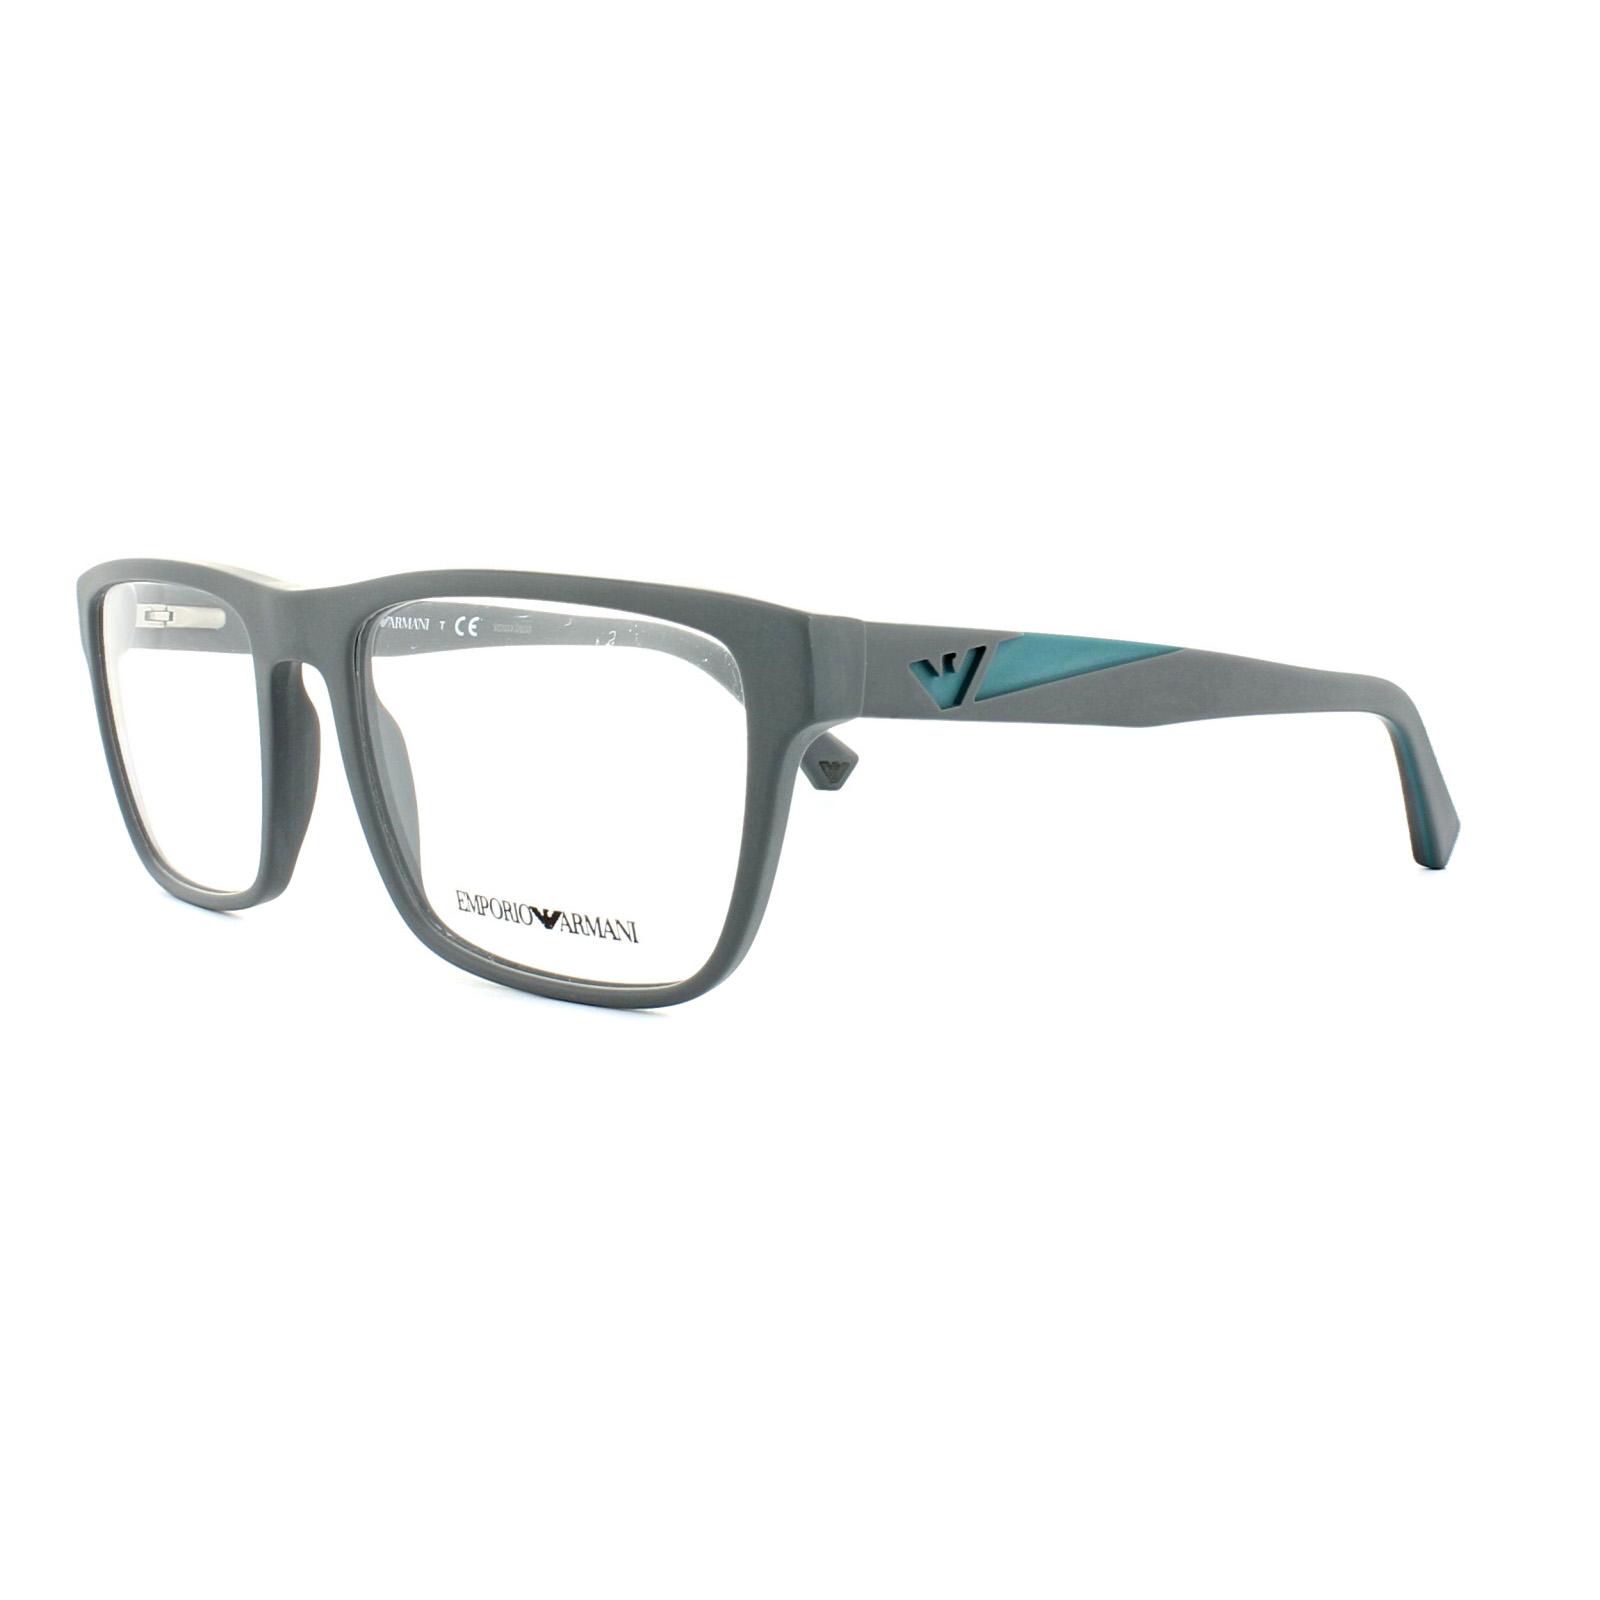 89912bcb Details about Emporio Armani Glasses Frames EA 3080 5502 Matte Grey Mens  55mm